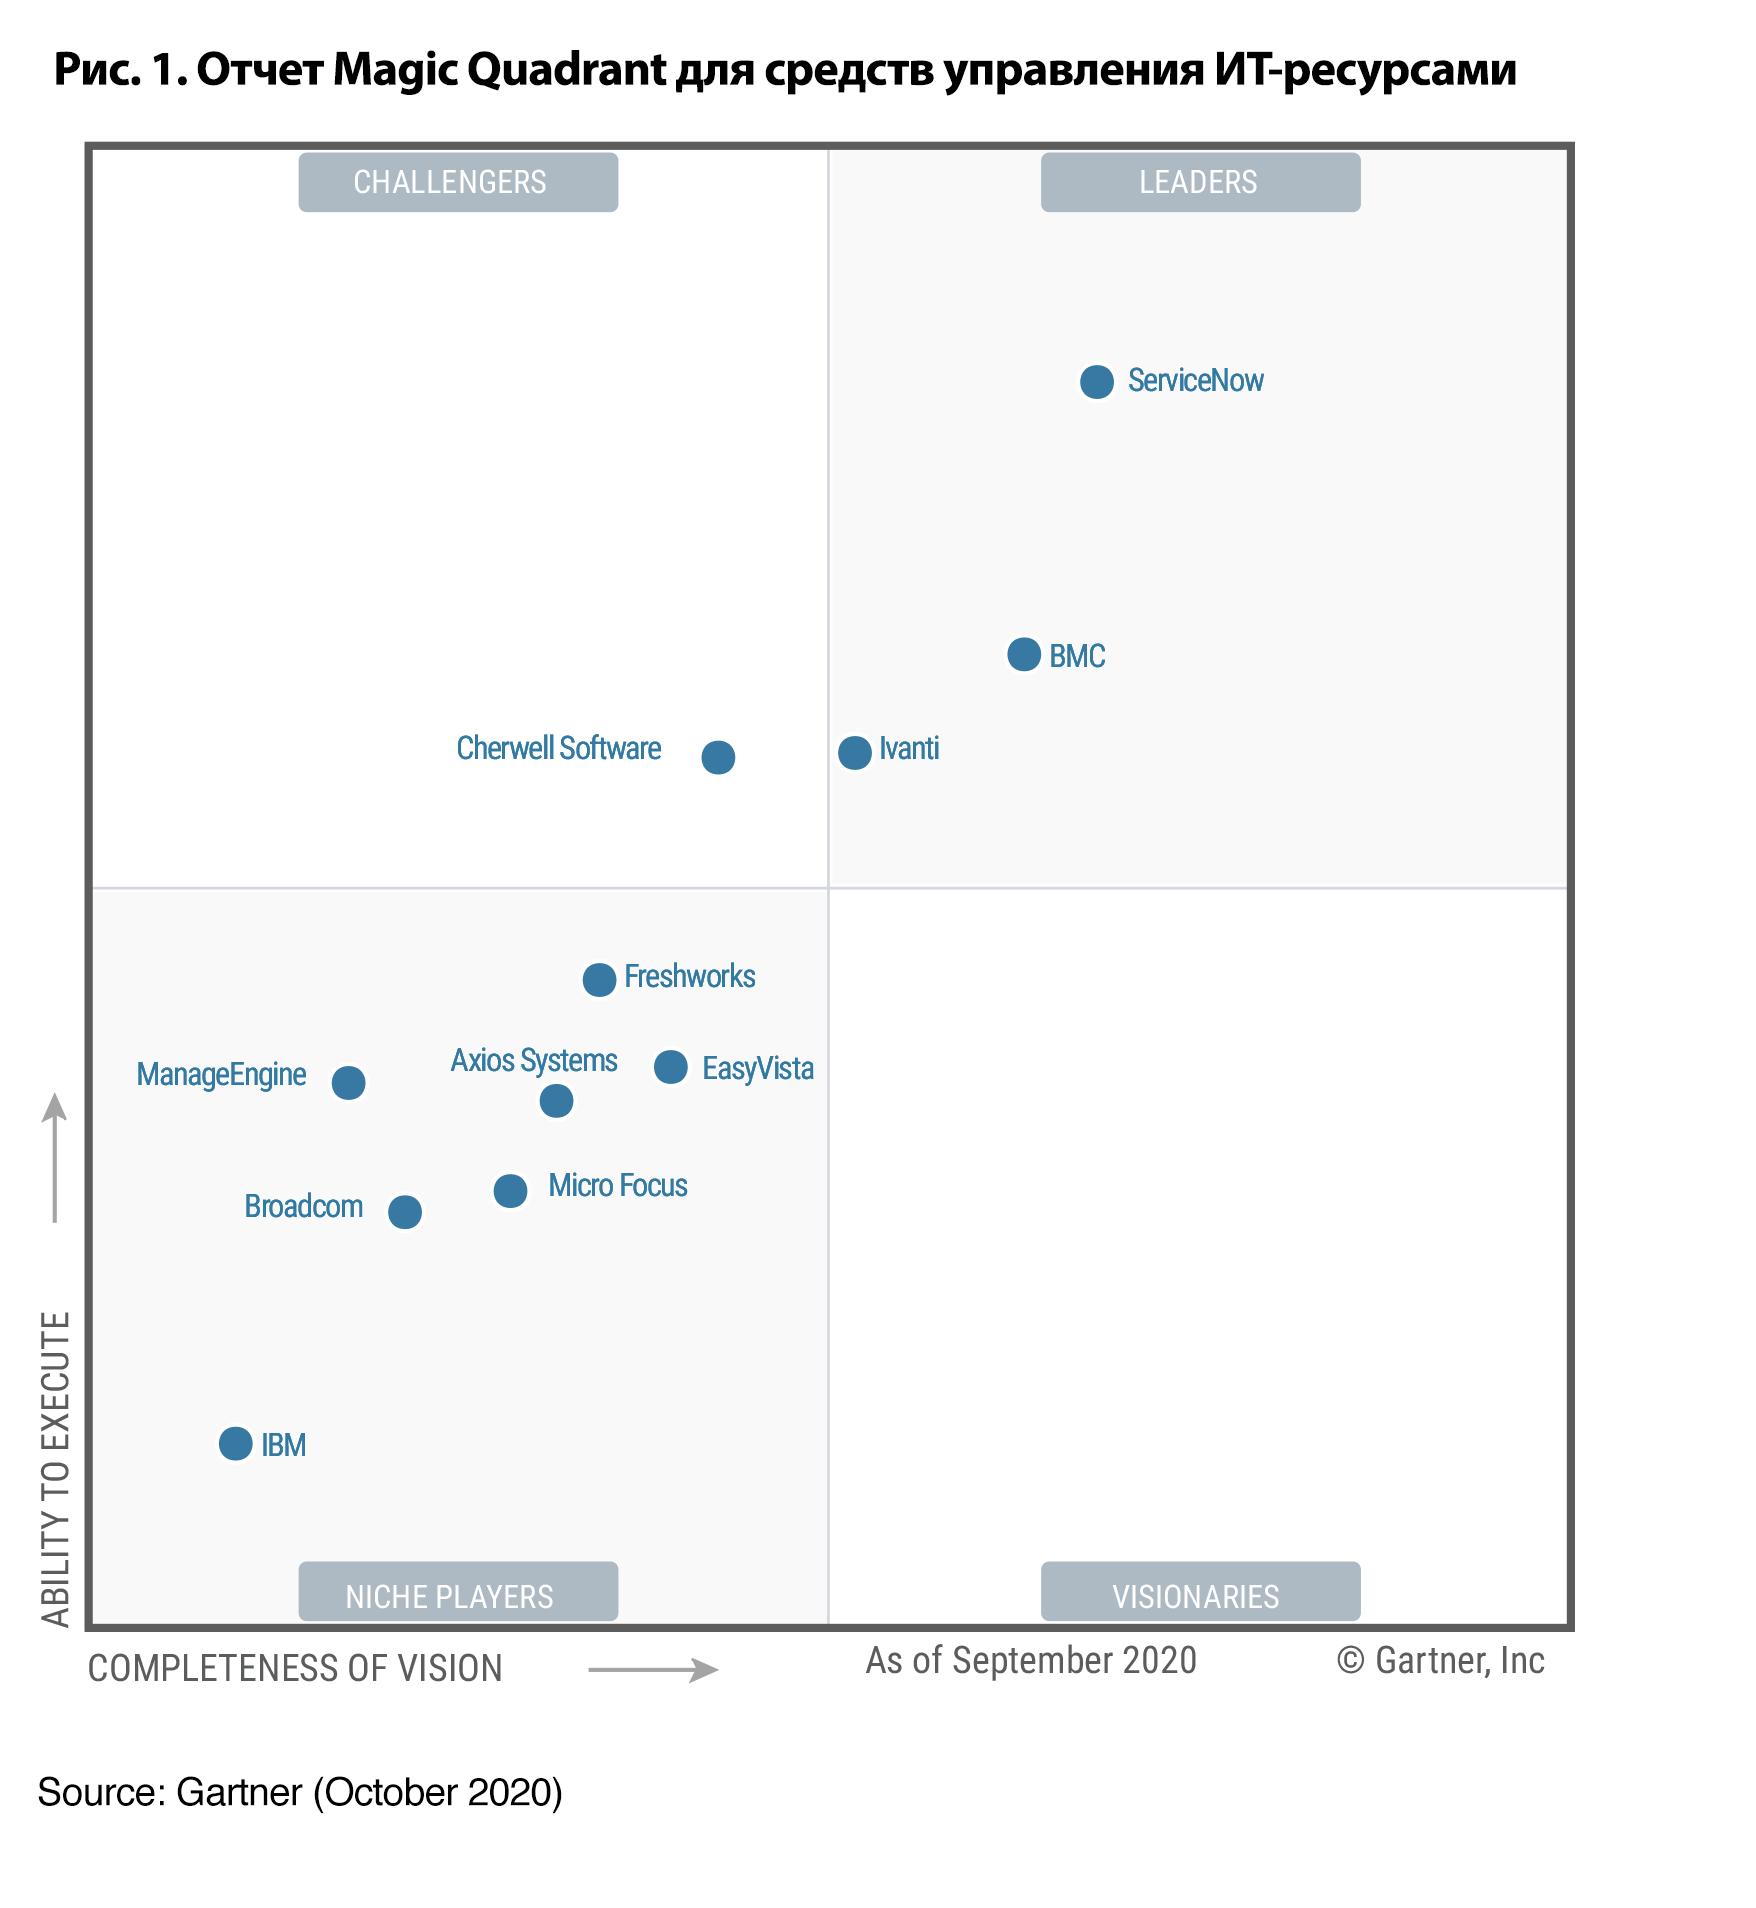 2020 Gartner magic quadrant for ITSM tools